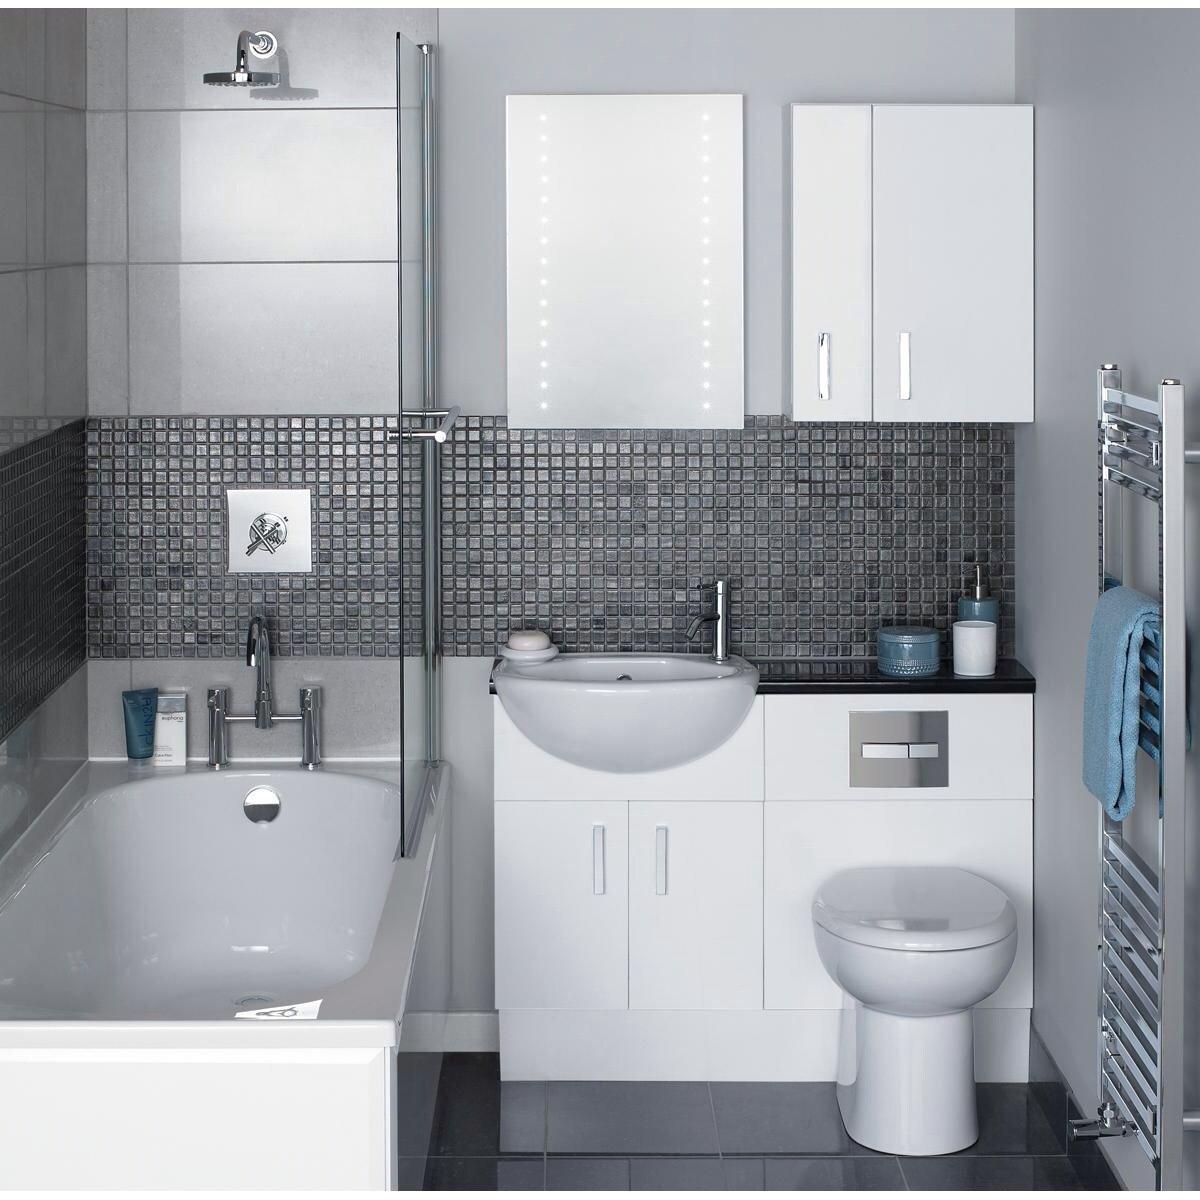 Bathrooms Designer Bathrooms Offered By Pudsey Bathrooms Ltd Pudsey